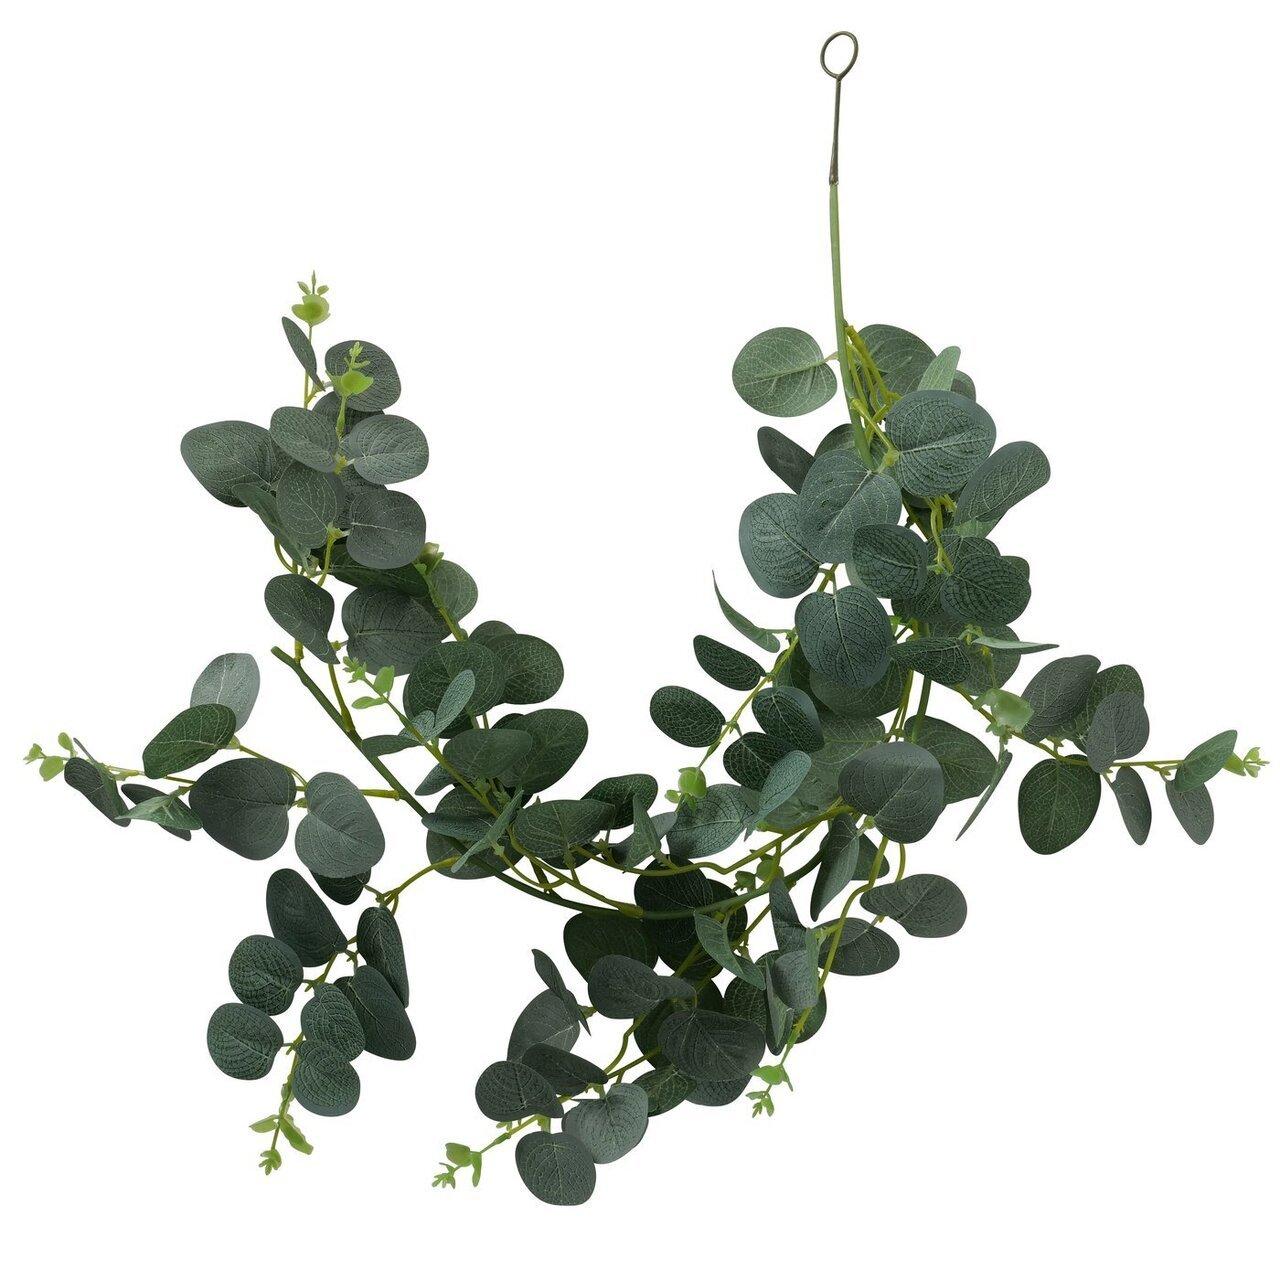 Boltze Pflanzengirlande Eukalyptus